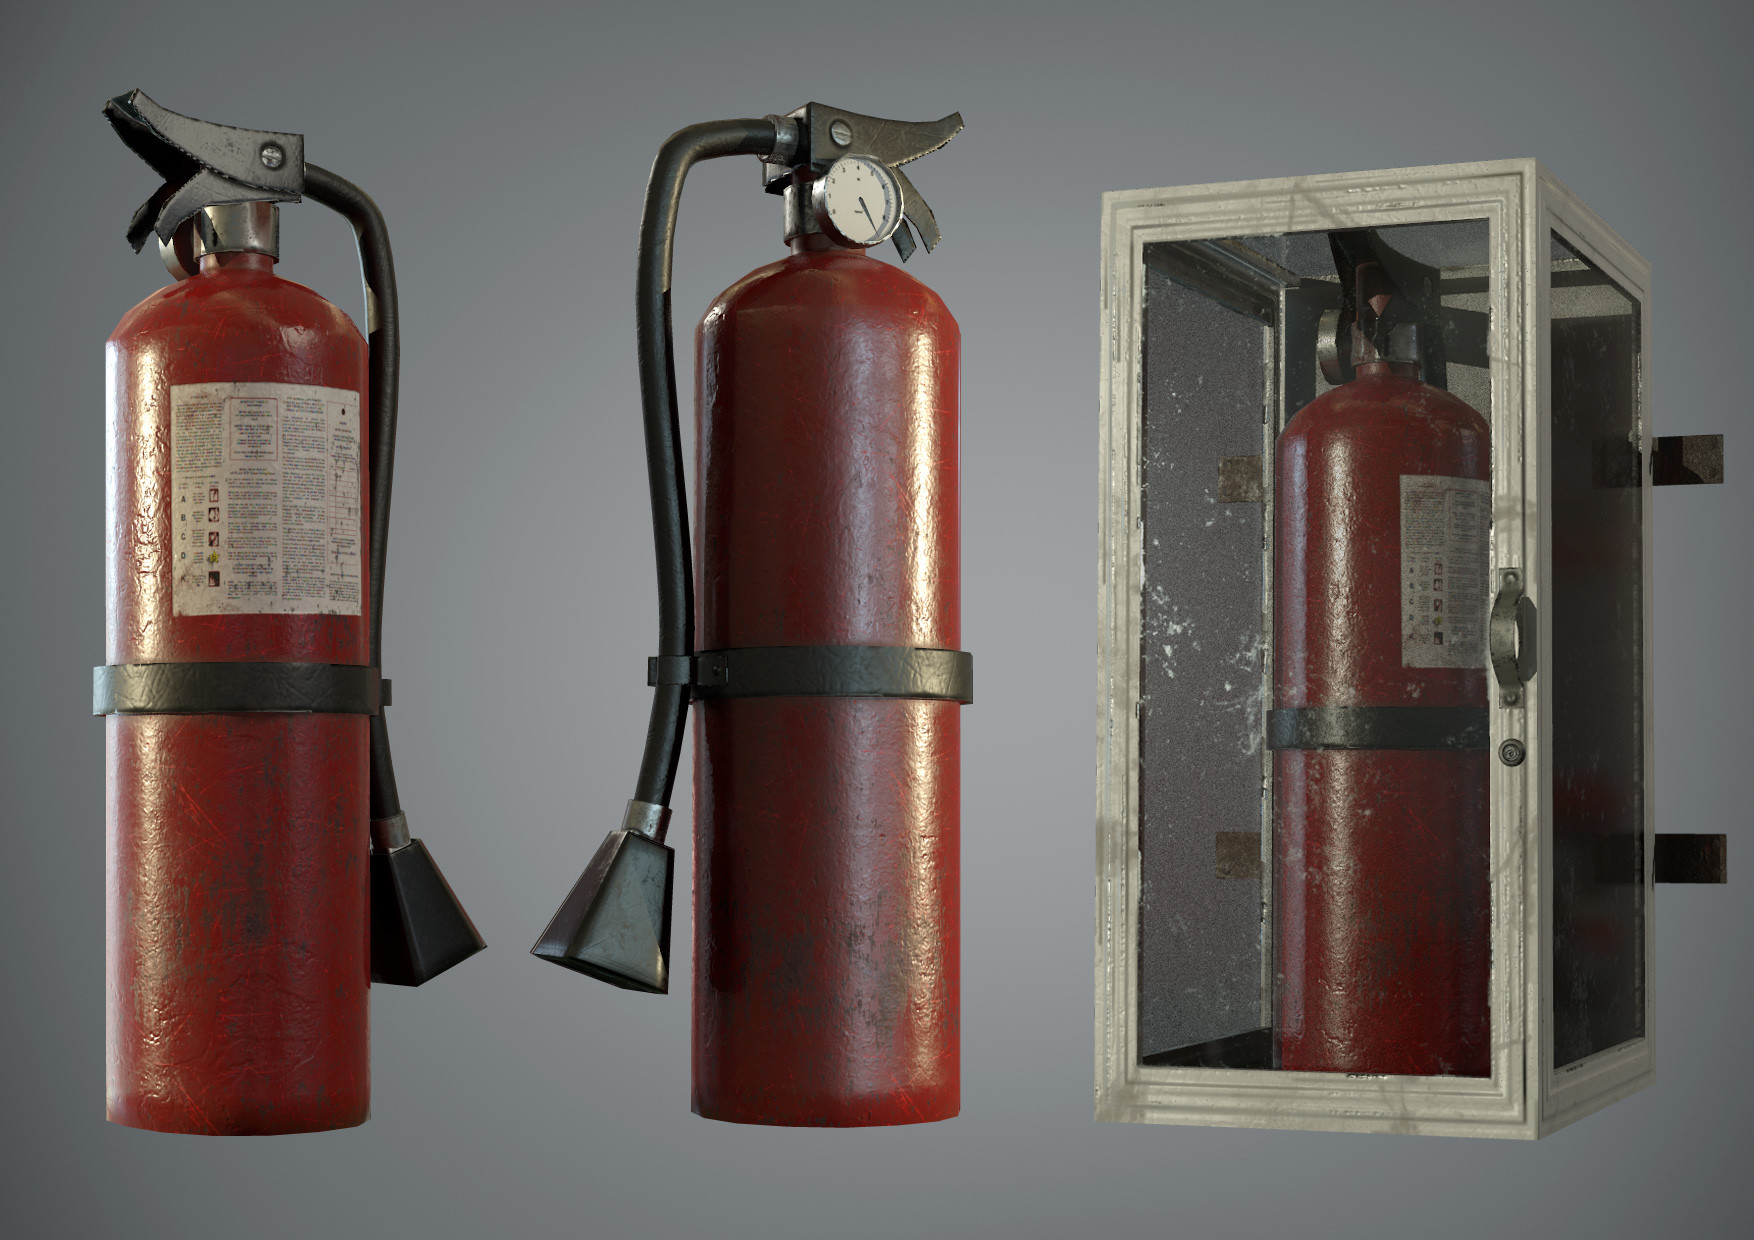 Andrew constantine fire extinguisher